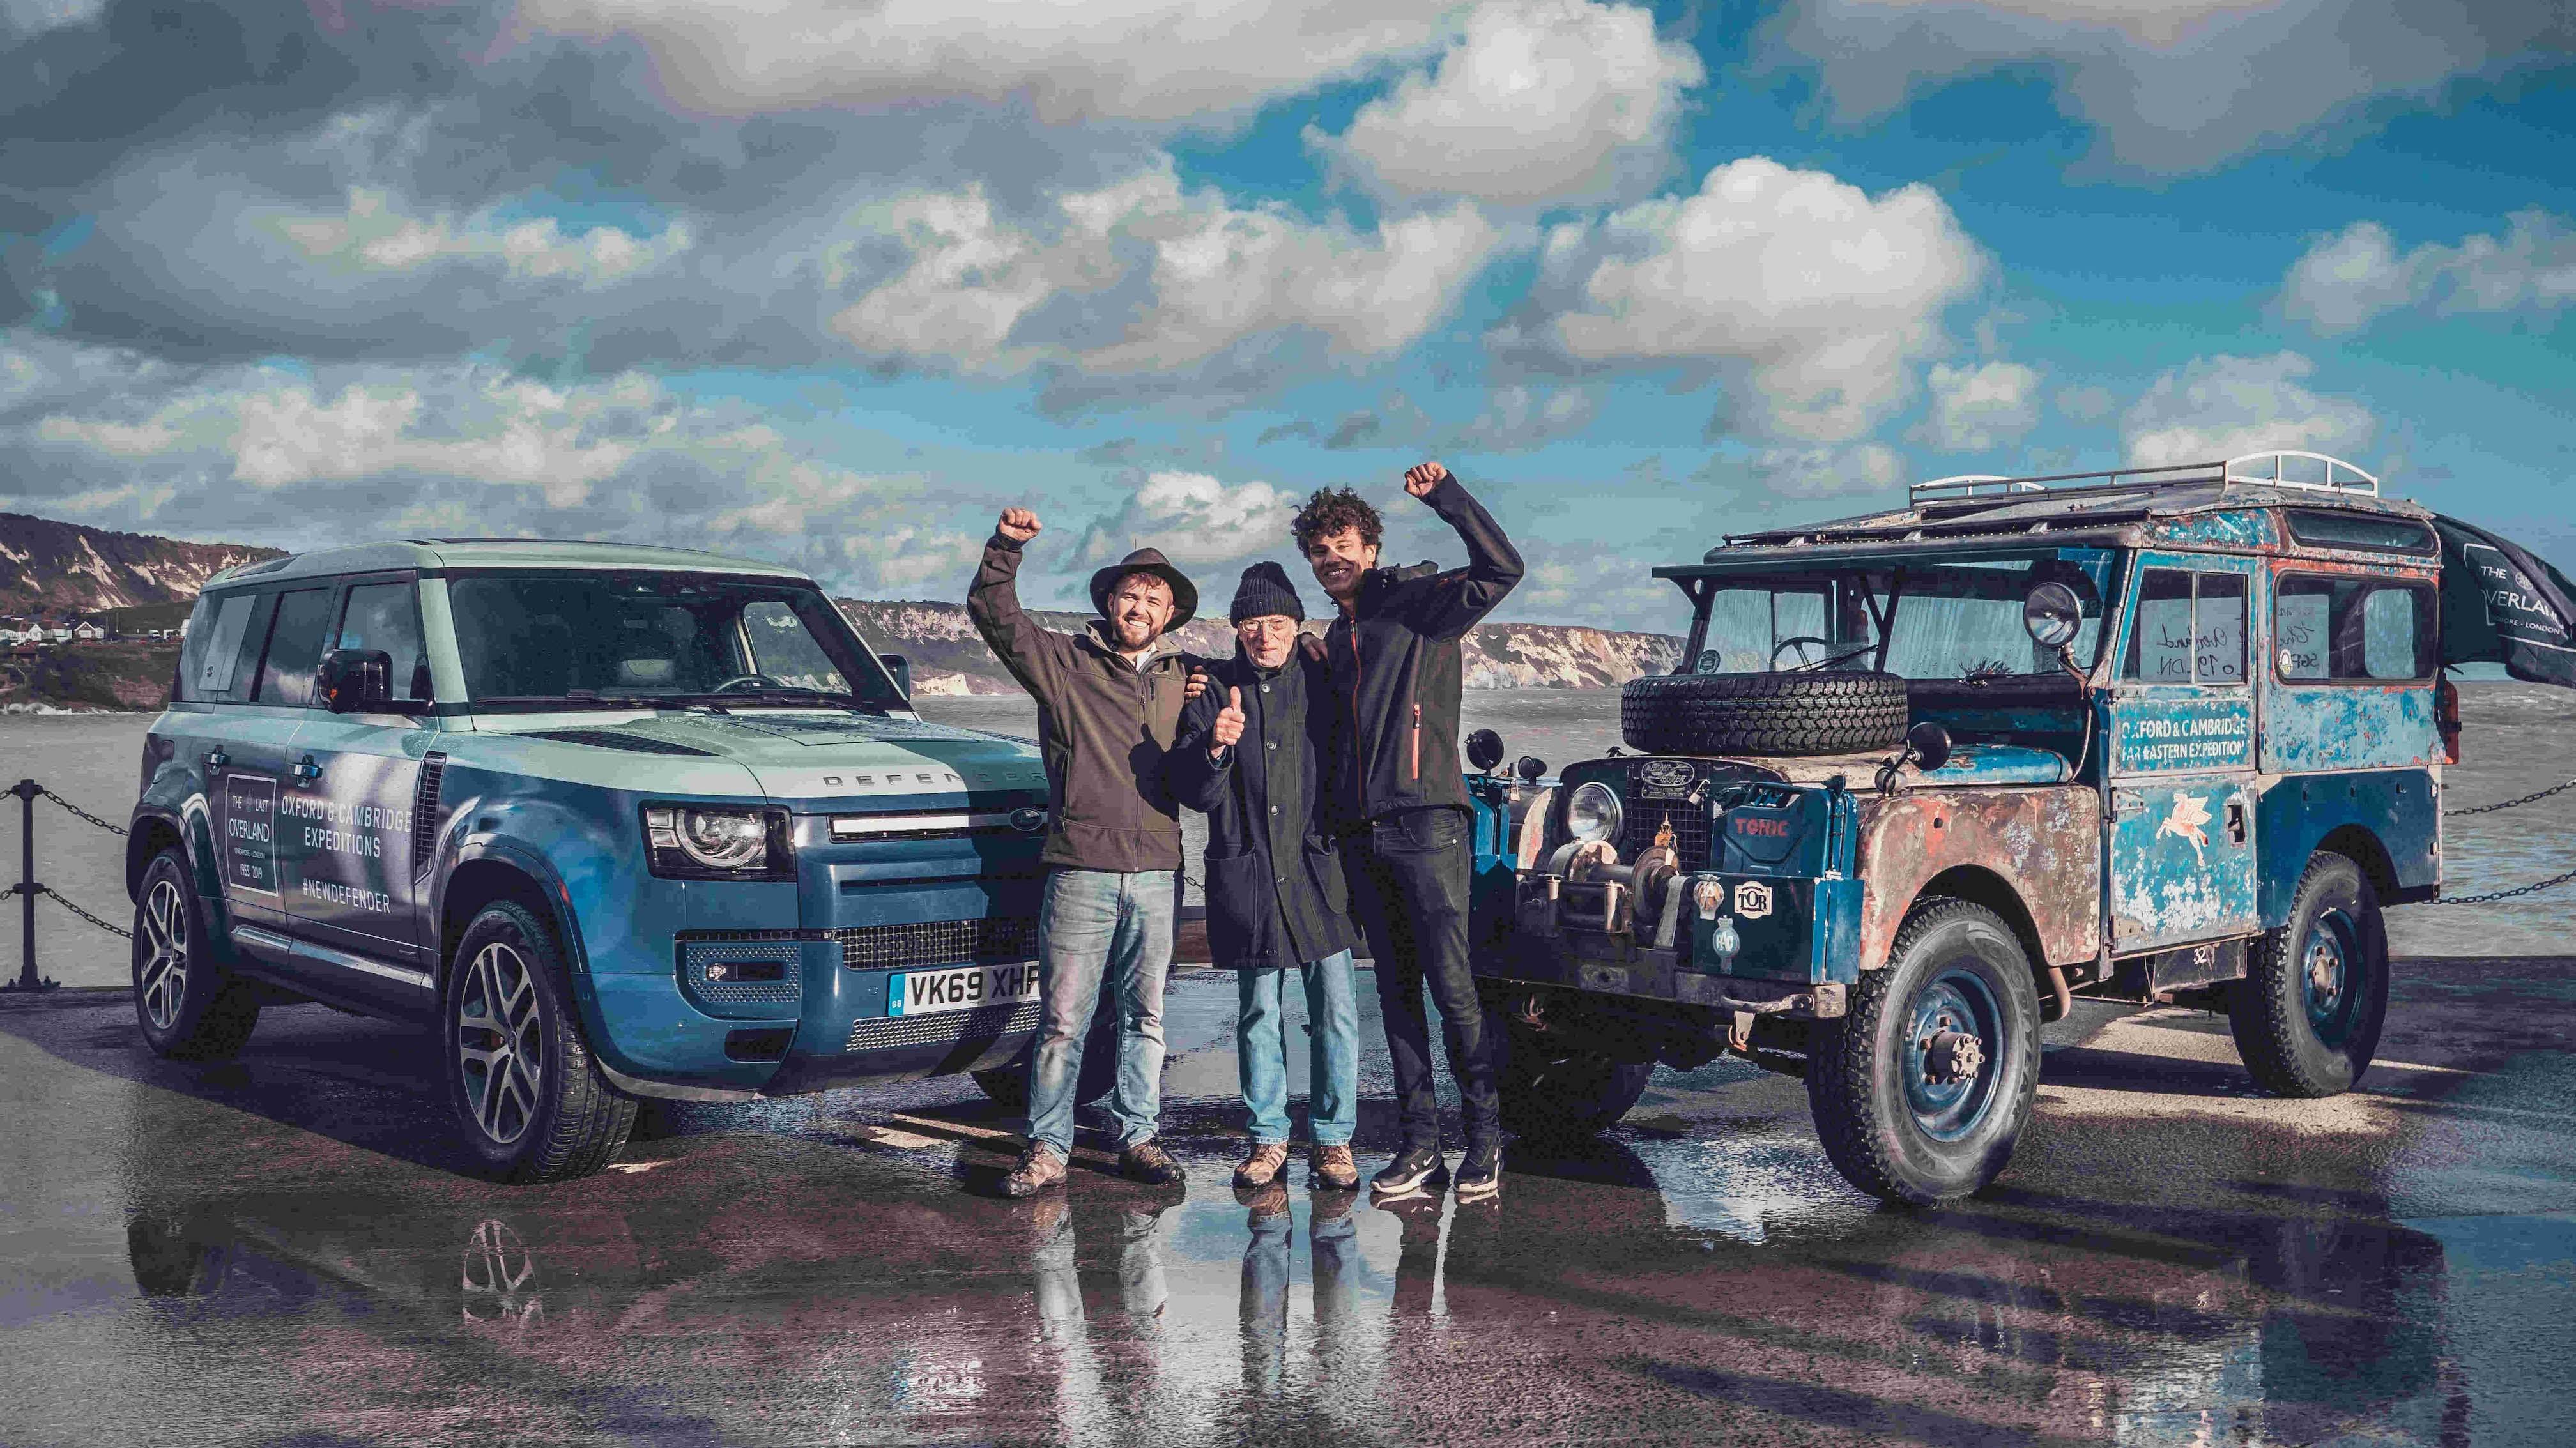 跨世代交會,全新 Land Rover Defender 迎接 The Last Overland 歐亞遠征隊重返倫敦